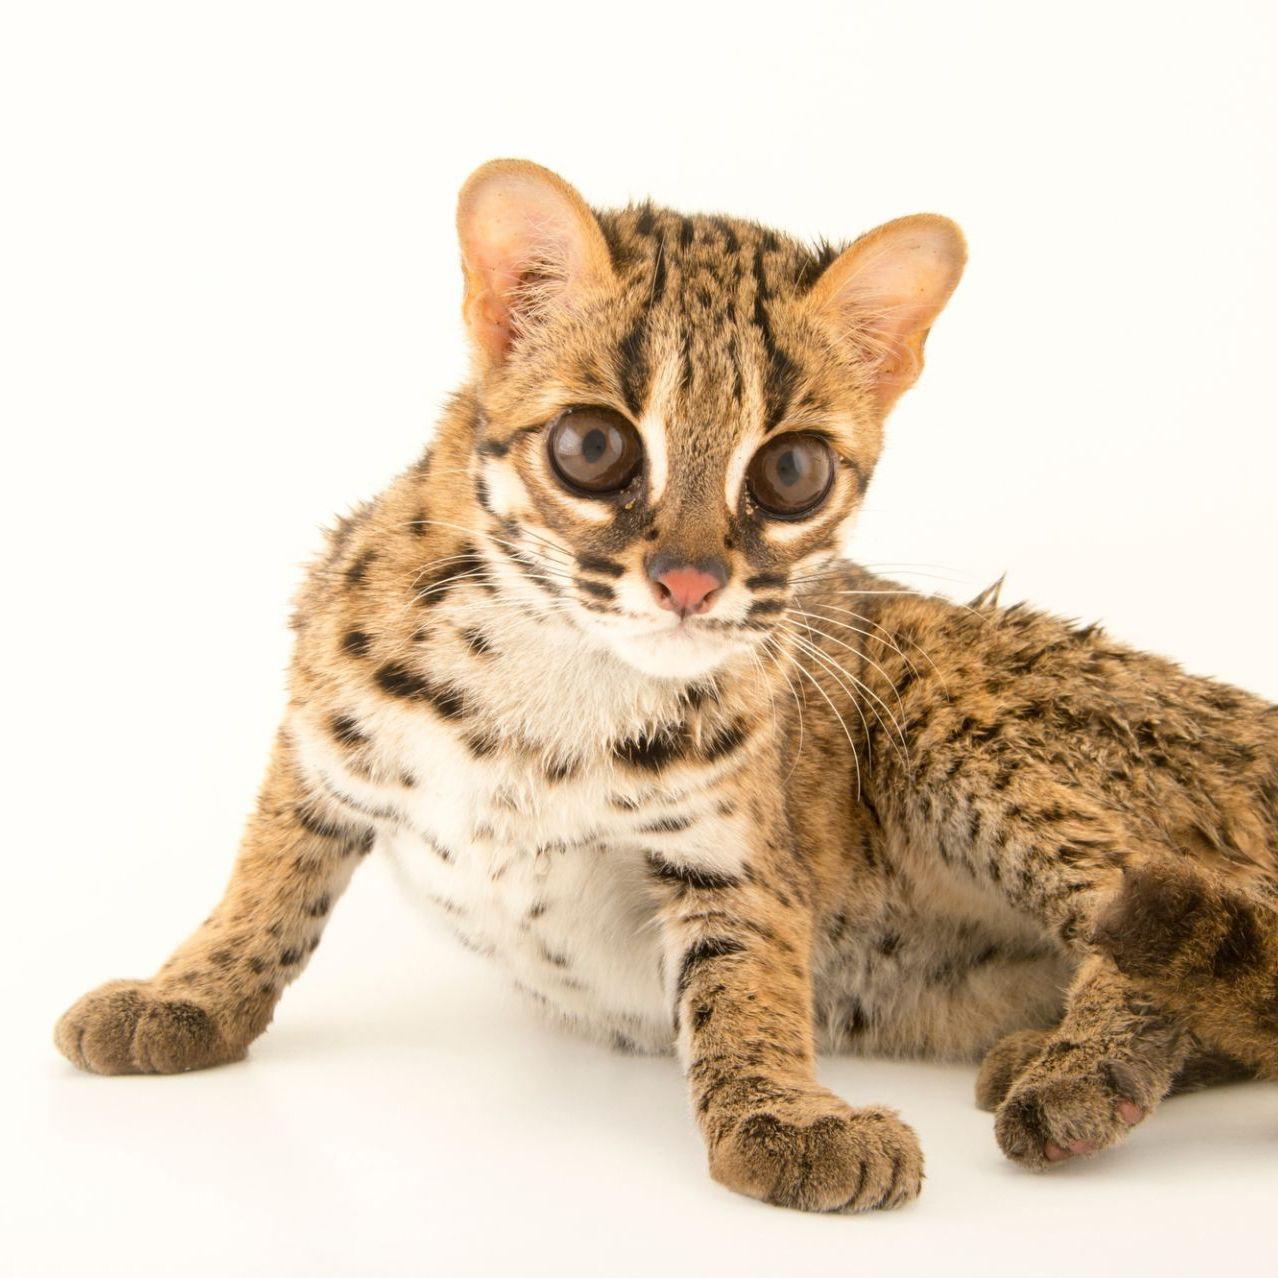 Pin by maxinjo on small wild cats Small wild cats, Cats